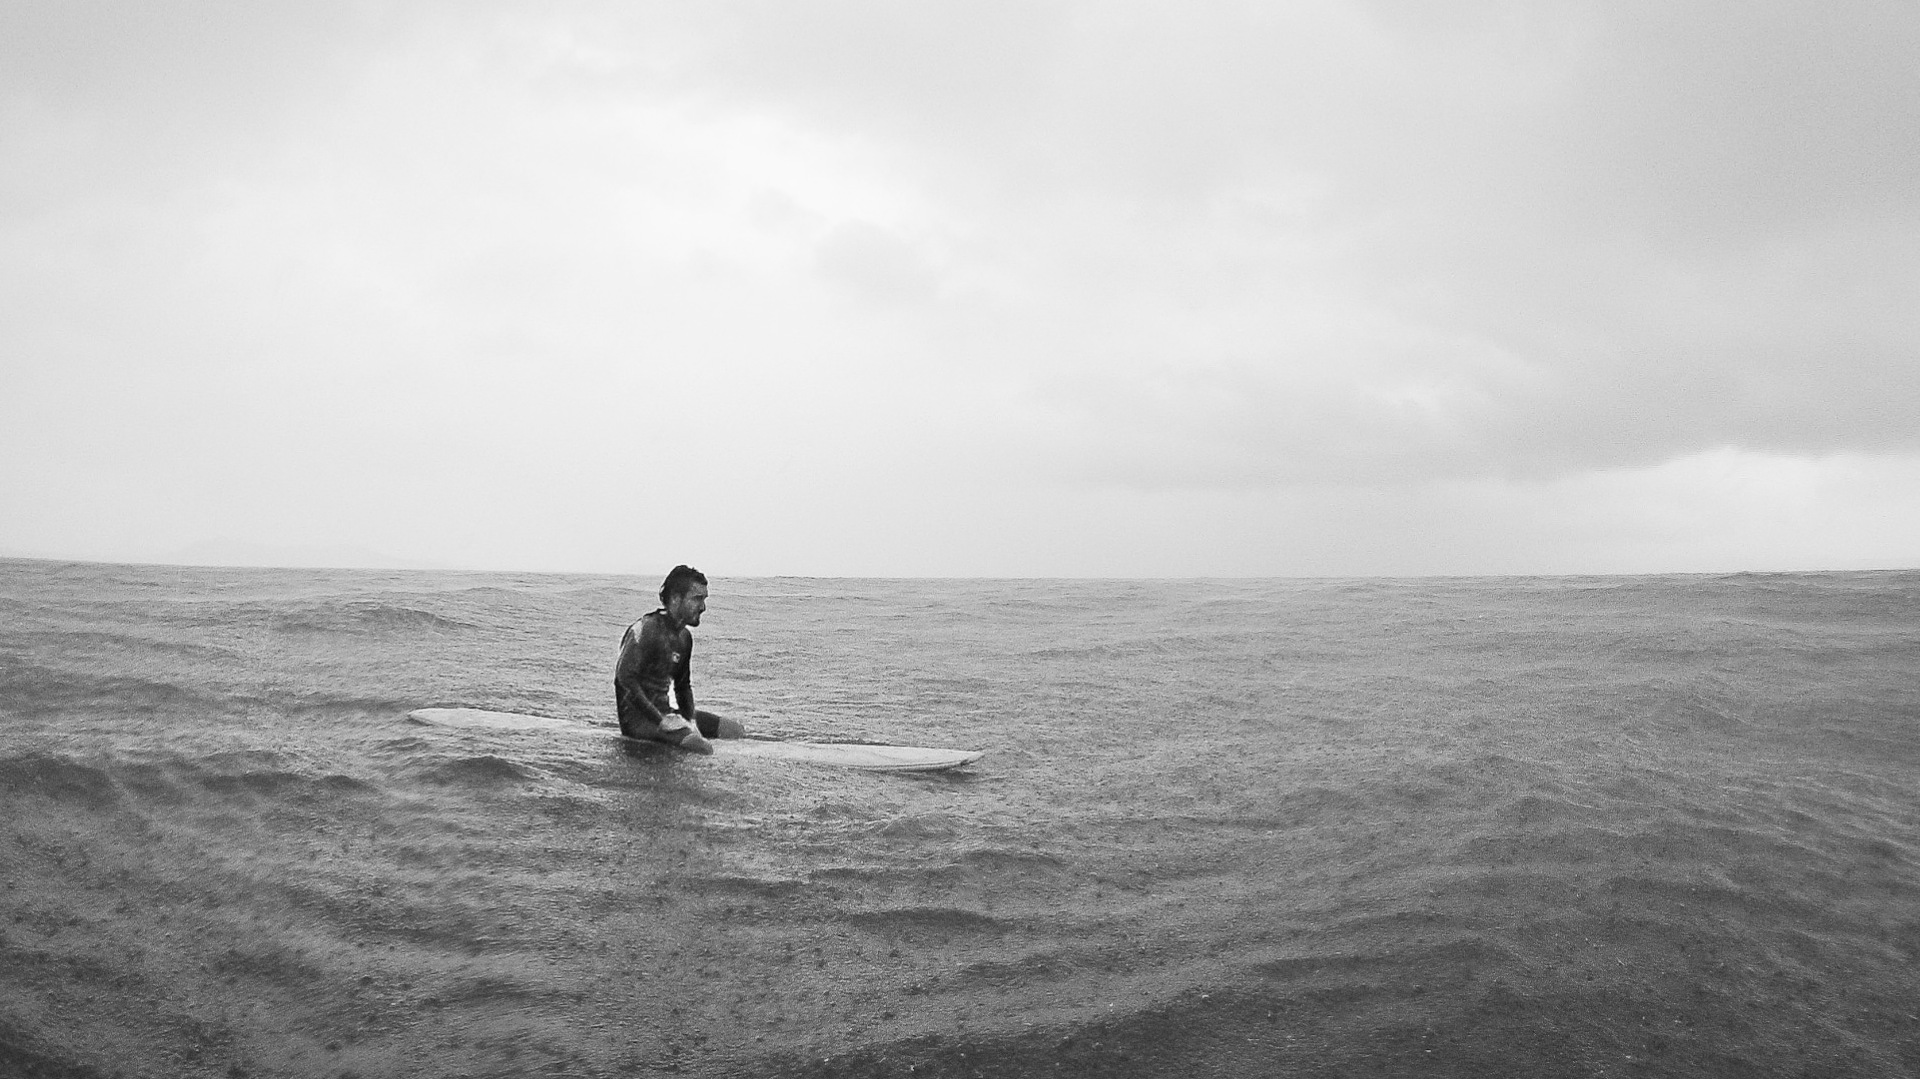 Fabio-siebert-surfboards-gabriel-vanini